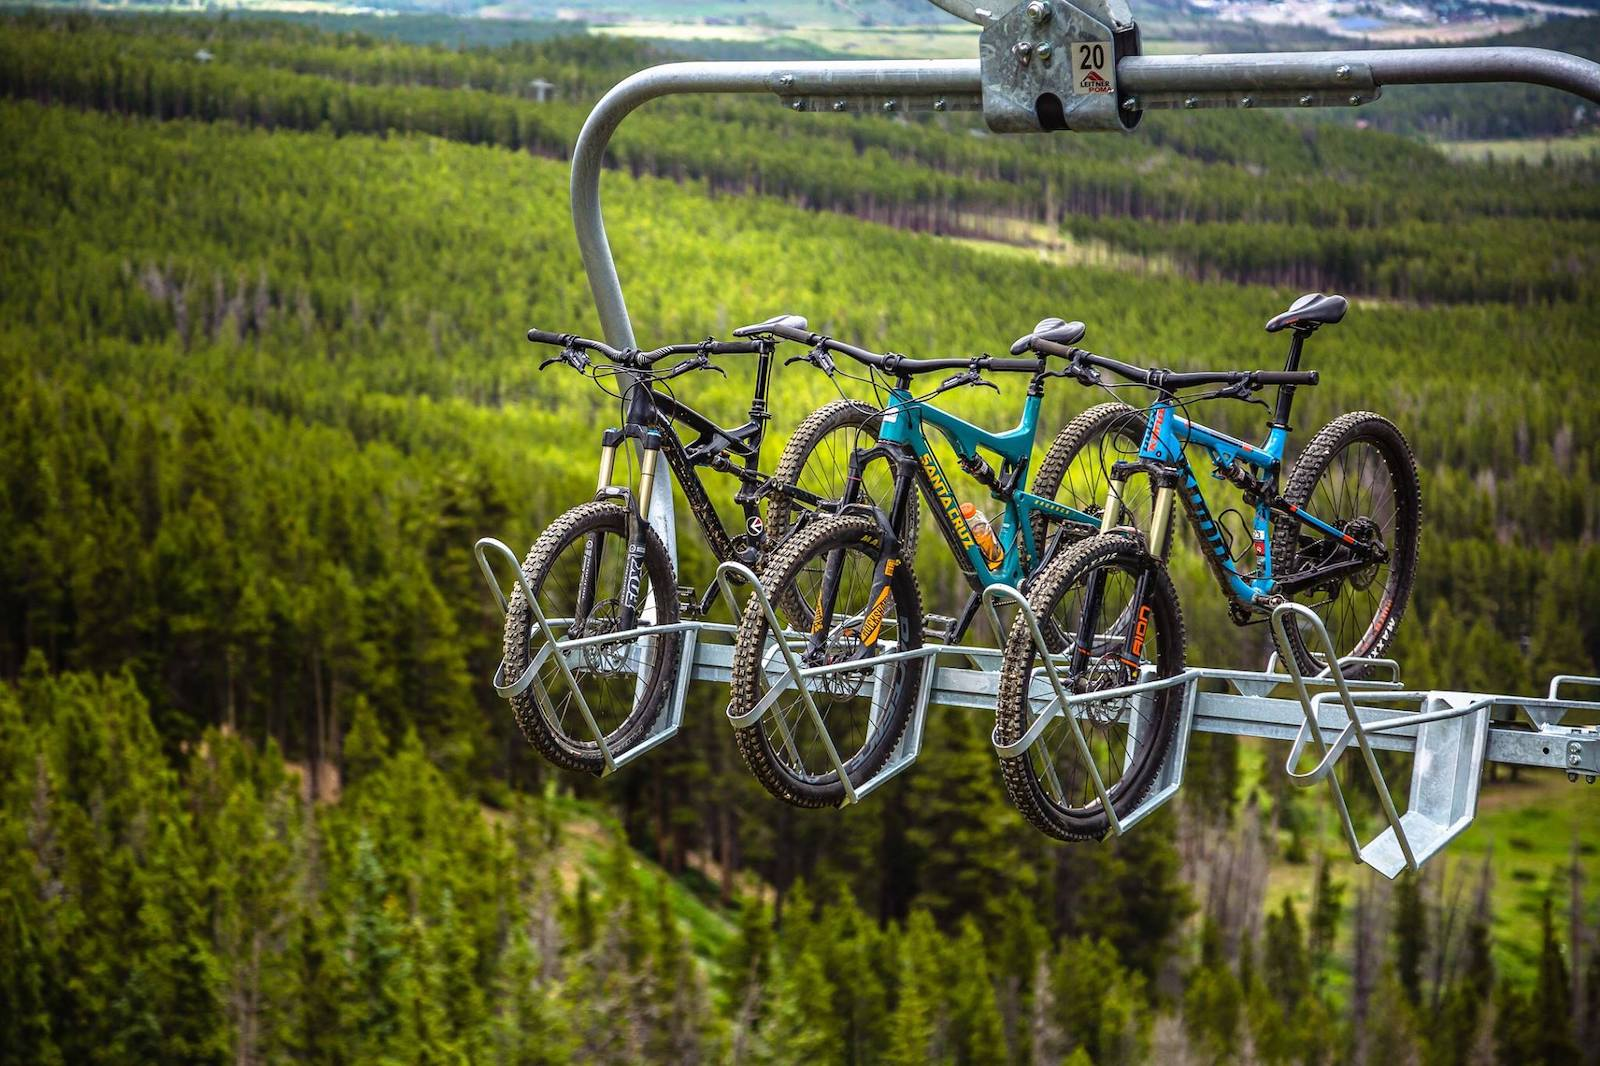 Image of bikes on the SuperChair at Breckenridge Ski Resort in Colorado